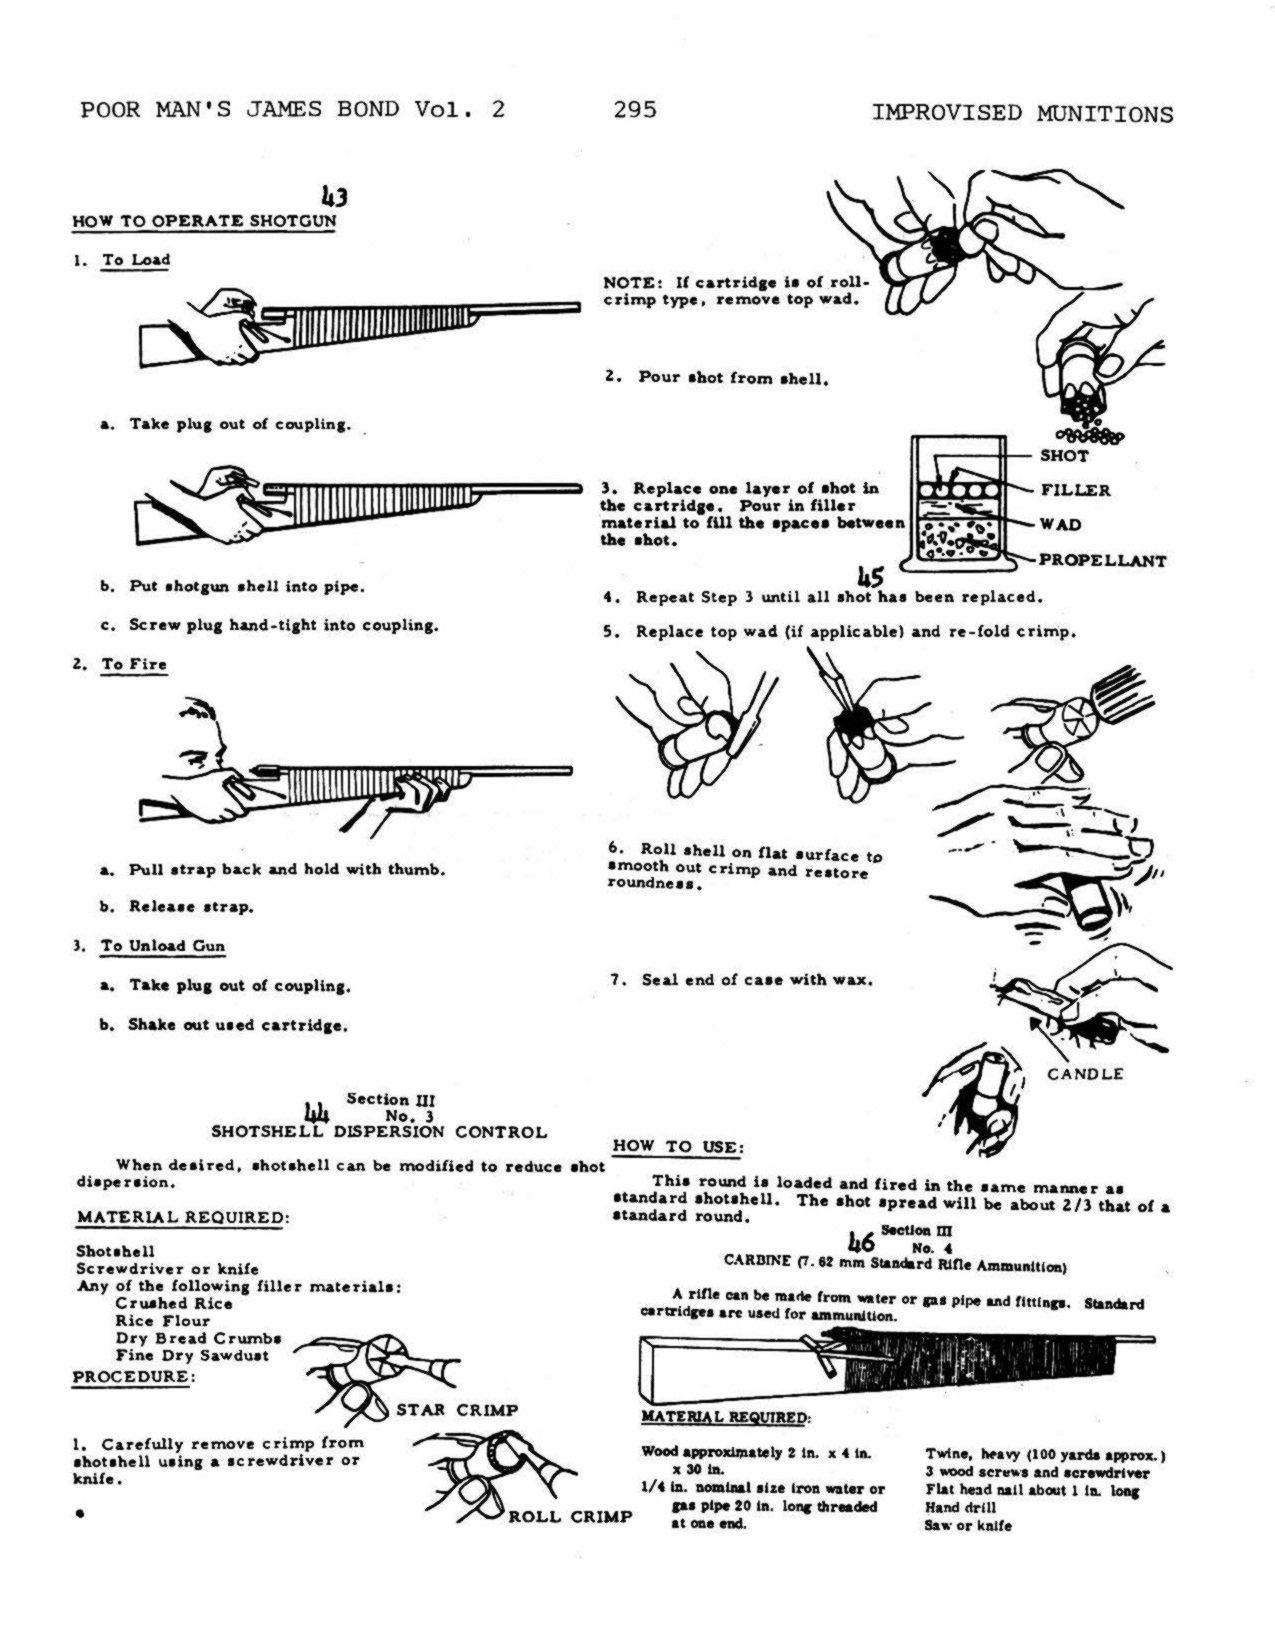 TM 31-210 Improvised Munitions Handbook (Poor Man's James Bond Volume II)  [Quality, Loose Leaf Facsimile]: Kurt Saxon, Department of the Army  Headquarters: ...